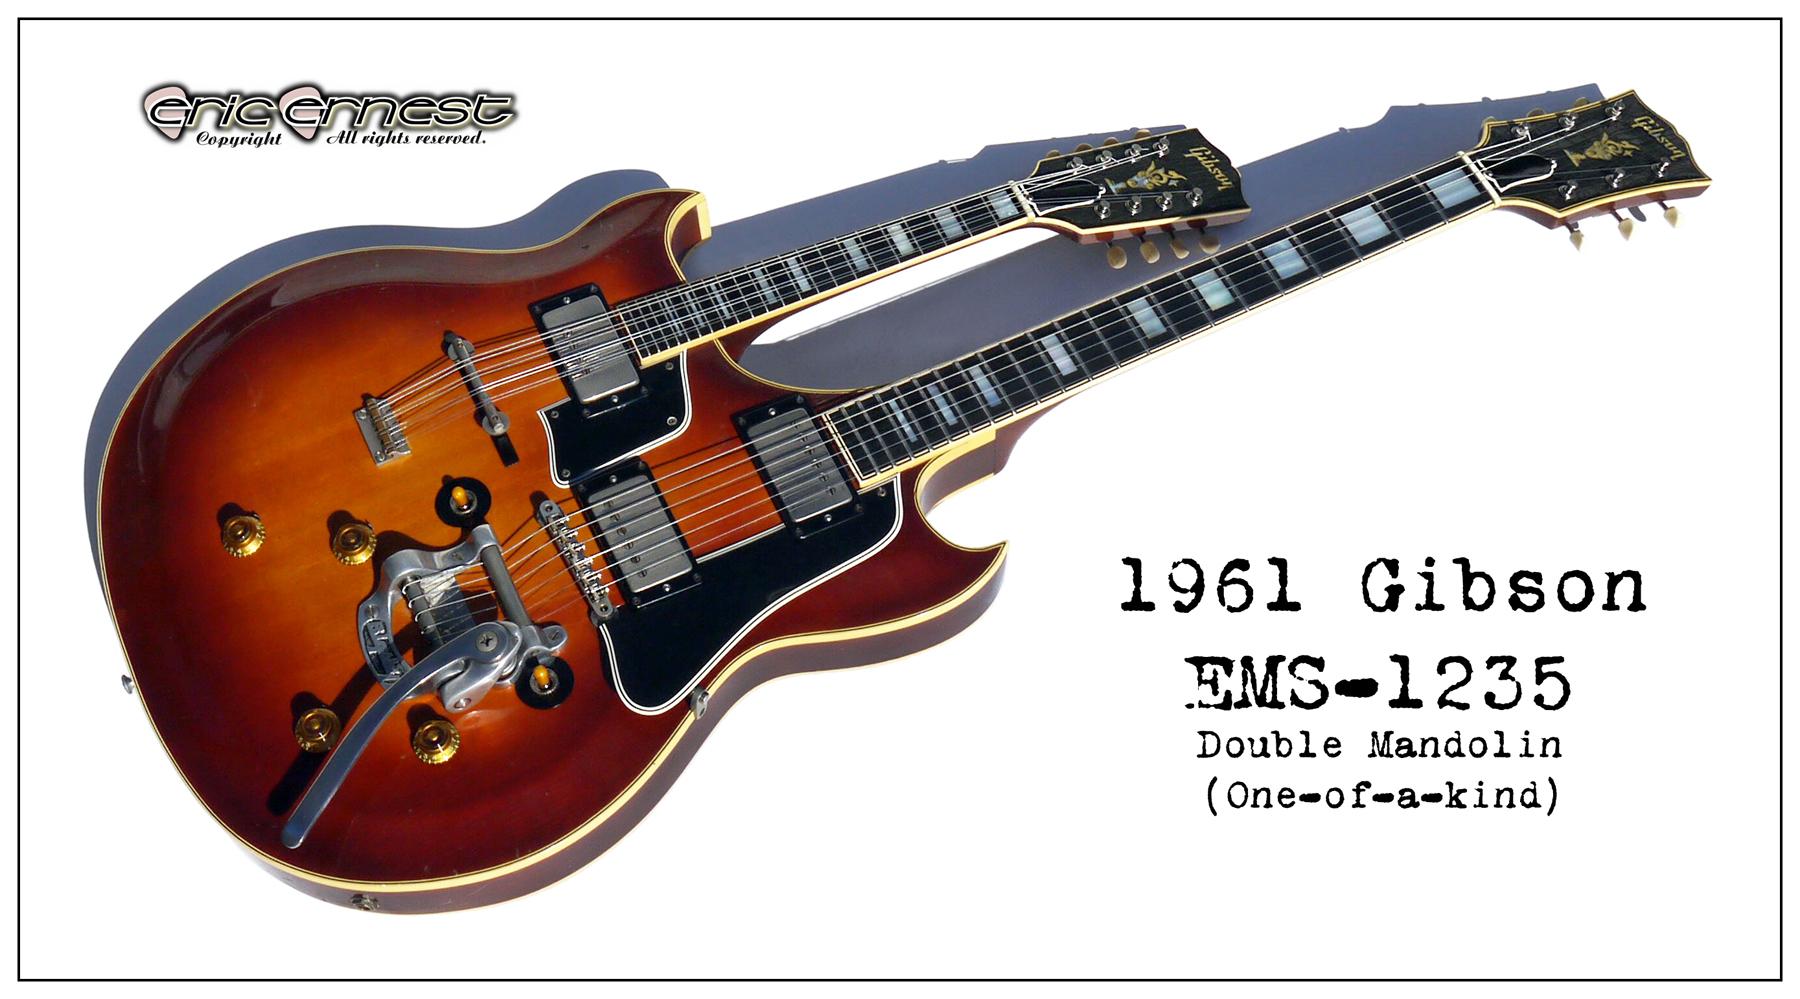 1957 1963 Gibson EMS-1235 double neck mandolin banjo octave